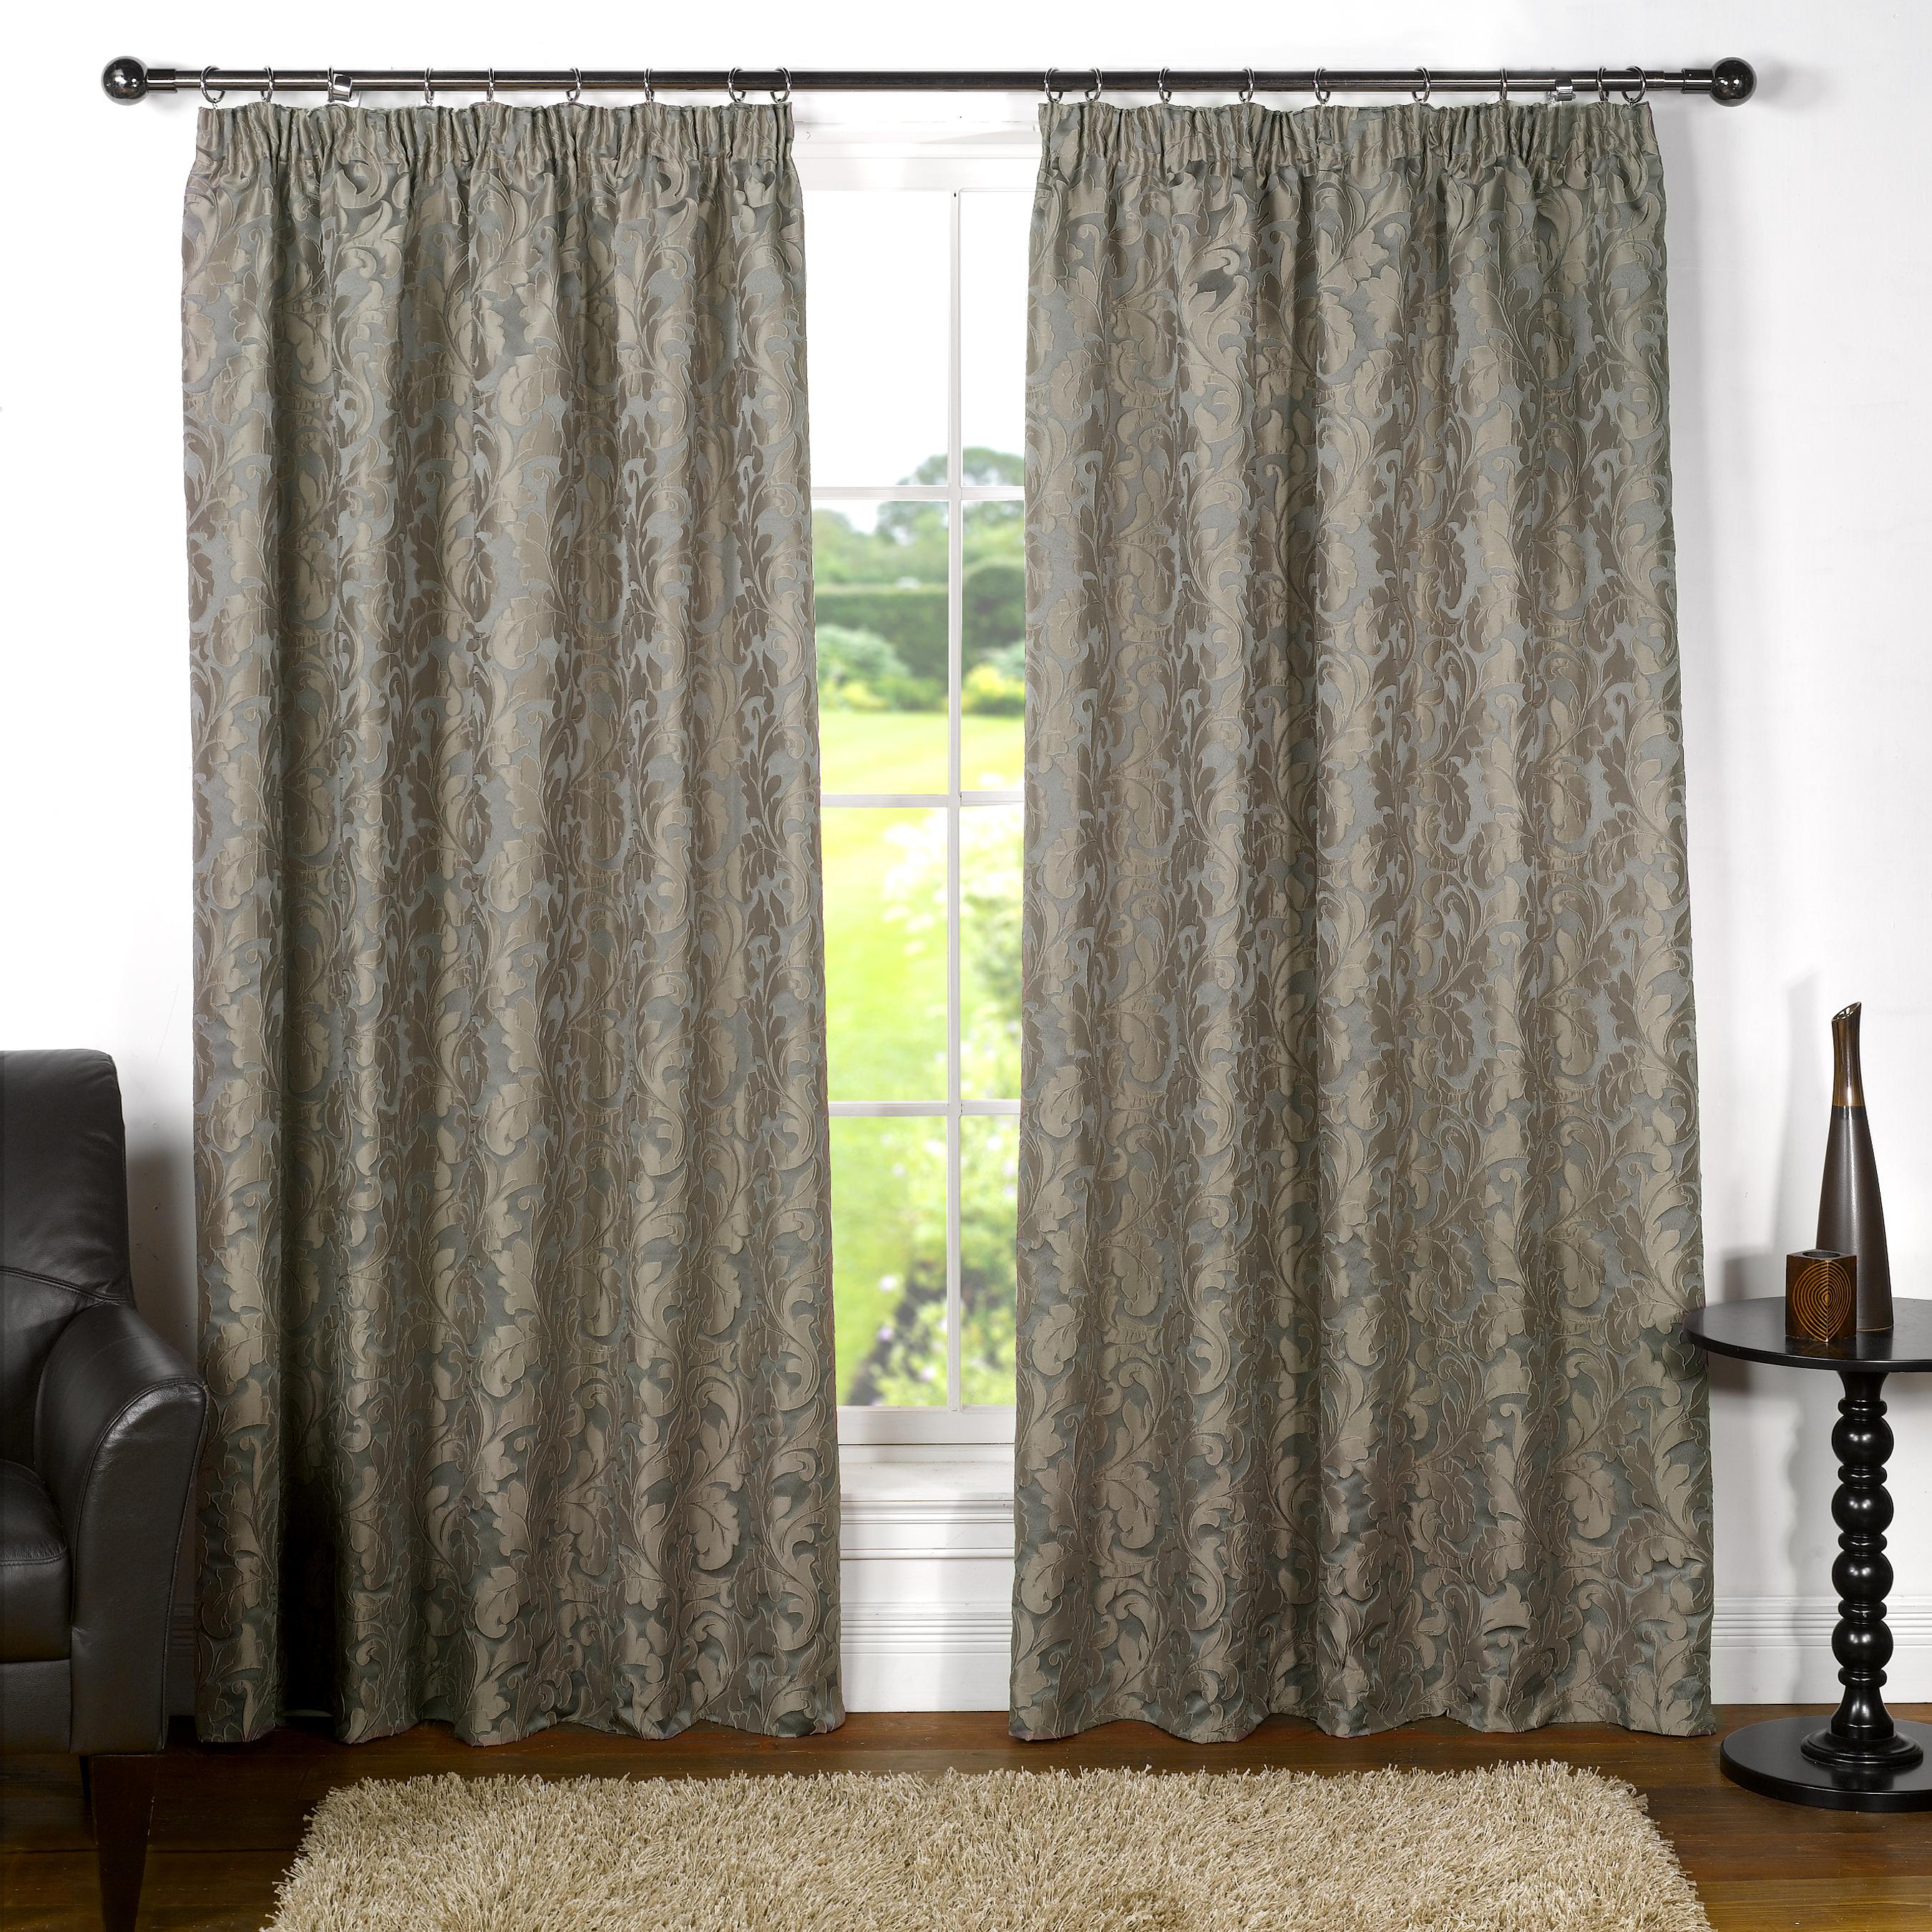 Tienda online cortinas sharemedoc for Cortinas espana